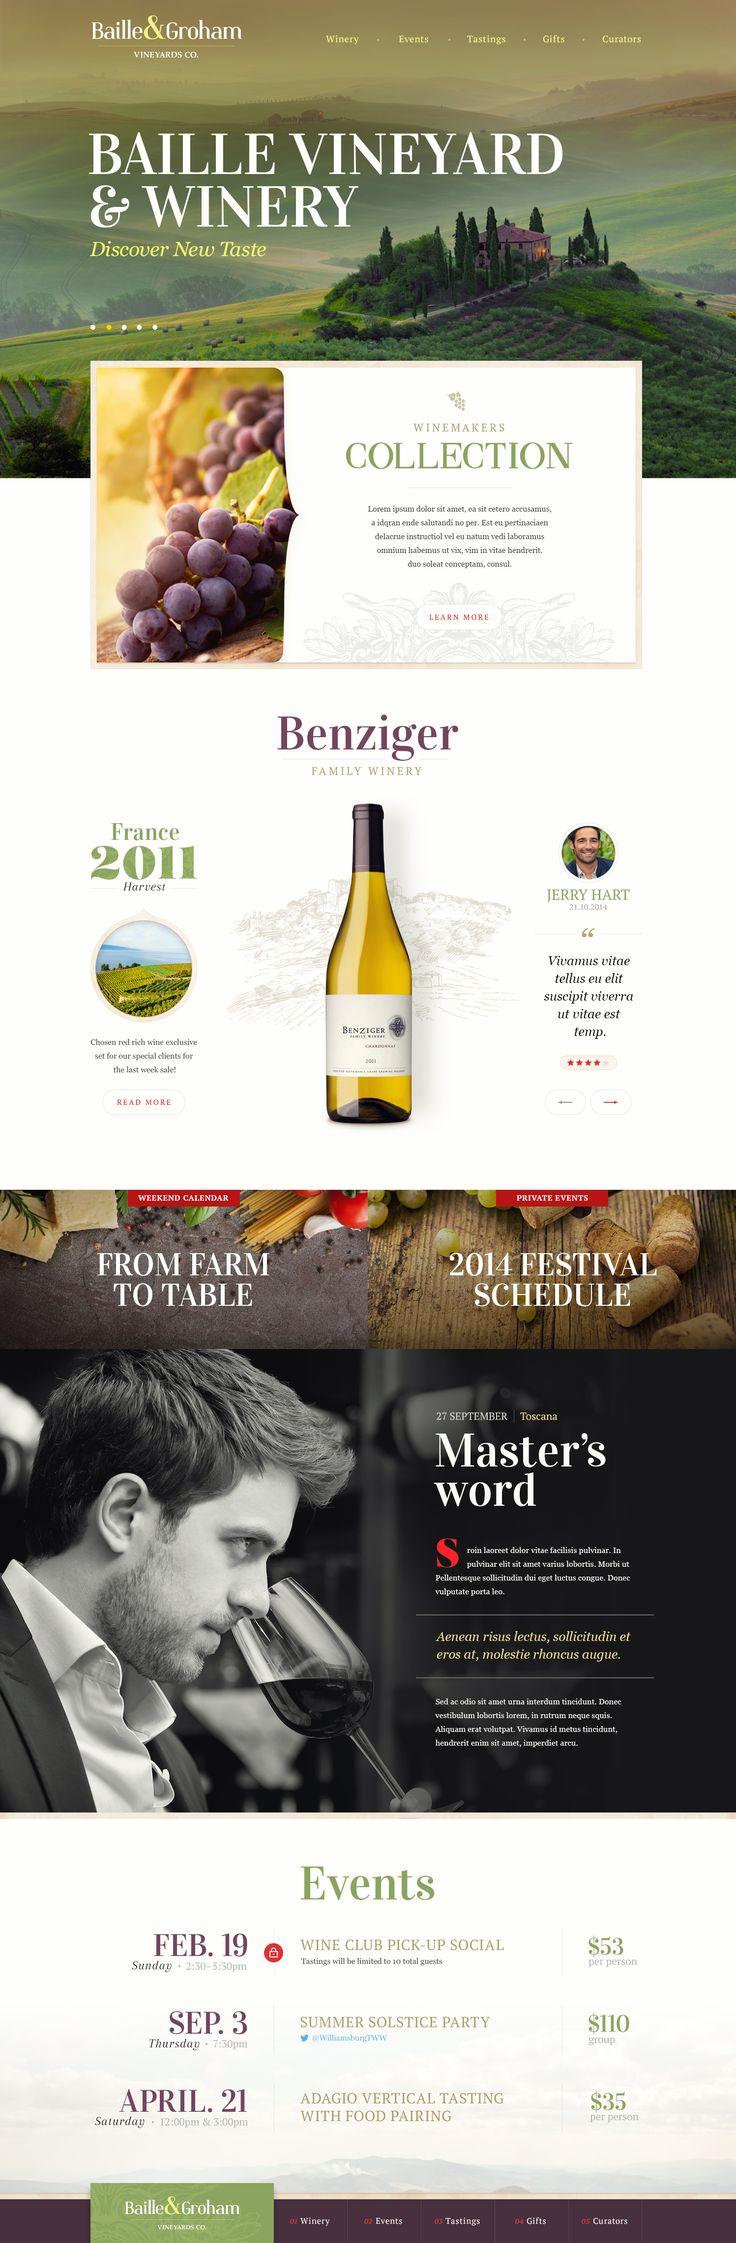 Wine web site design